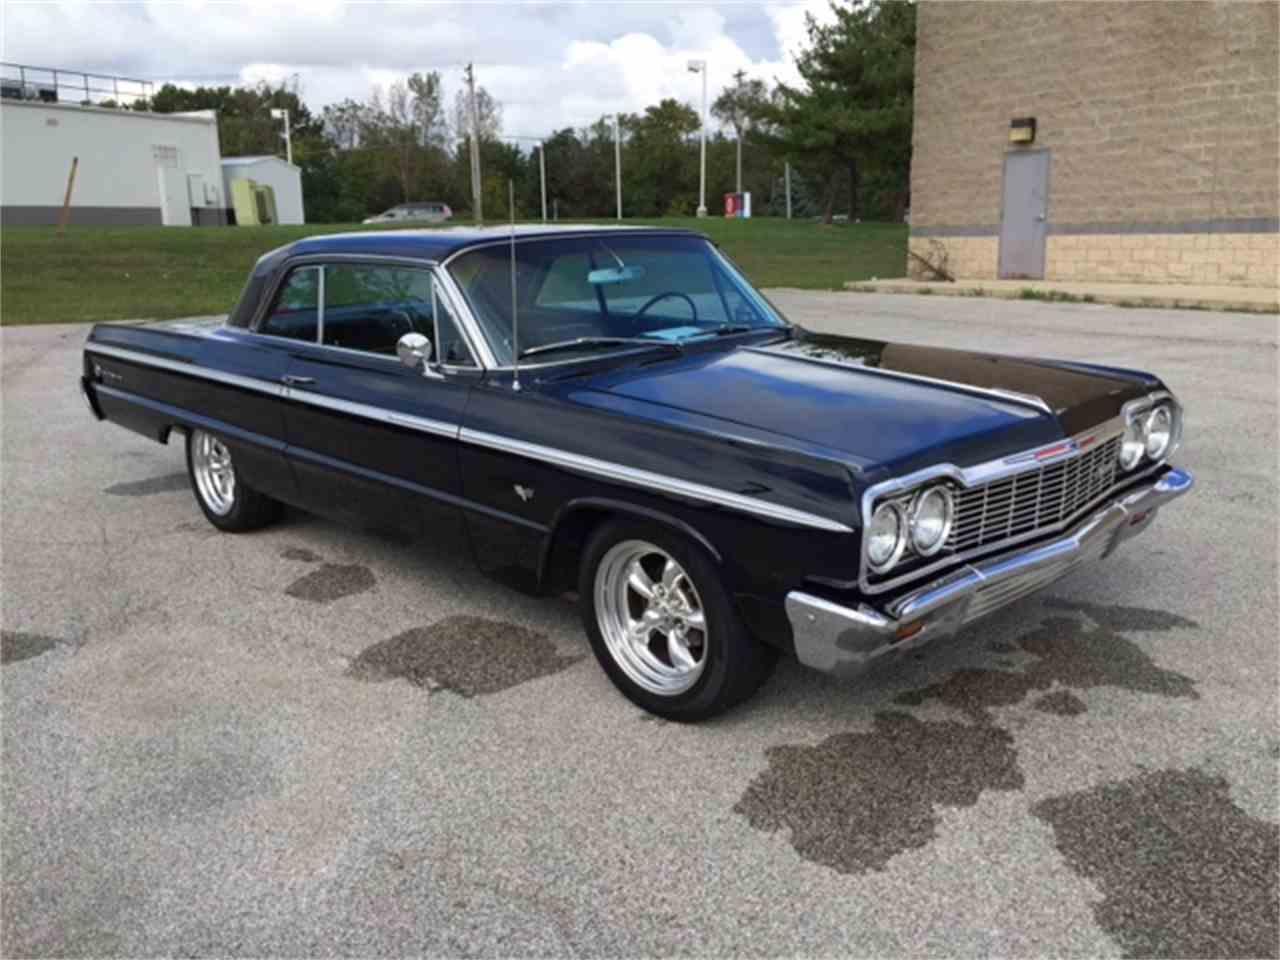 1964 chevrolet impala ss for sale cc 977267. Black Bedroom Furniture Sets. Home Design Ideas